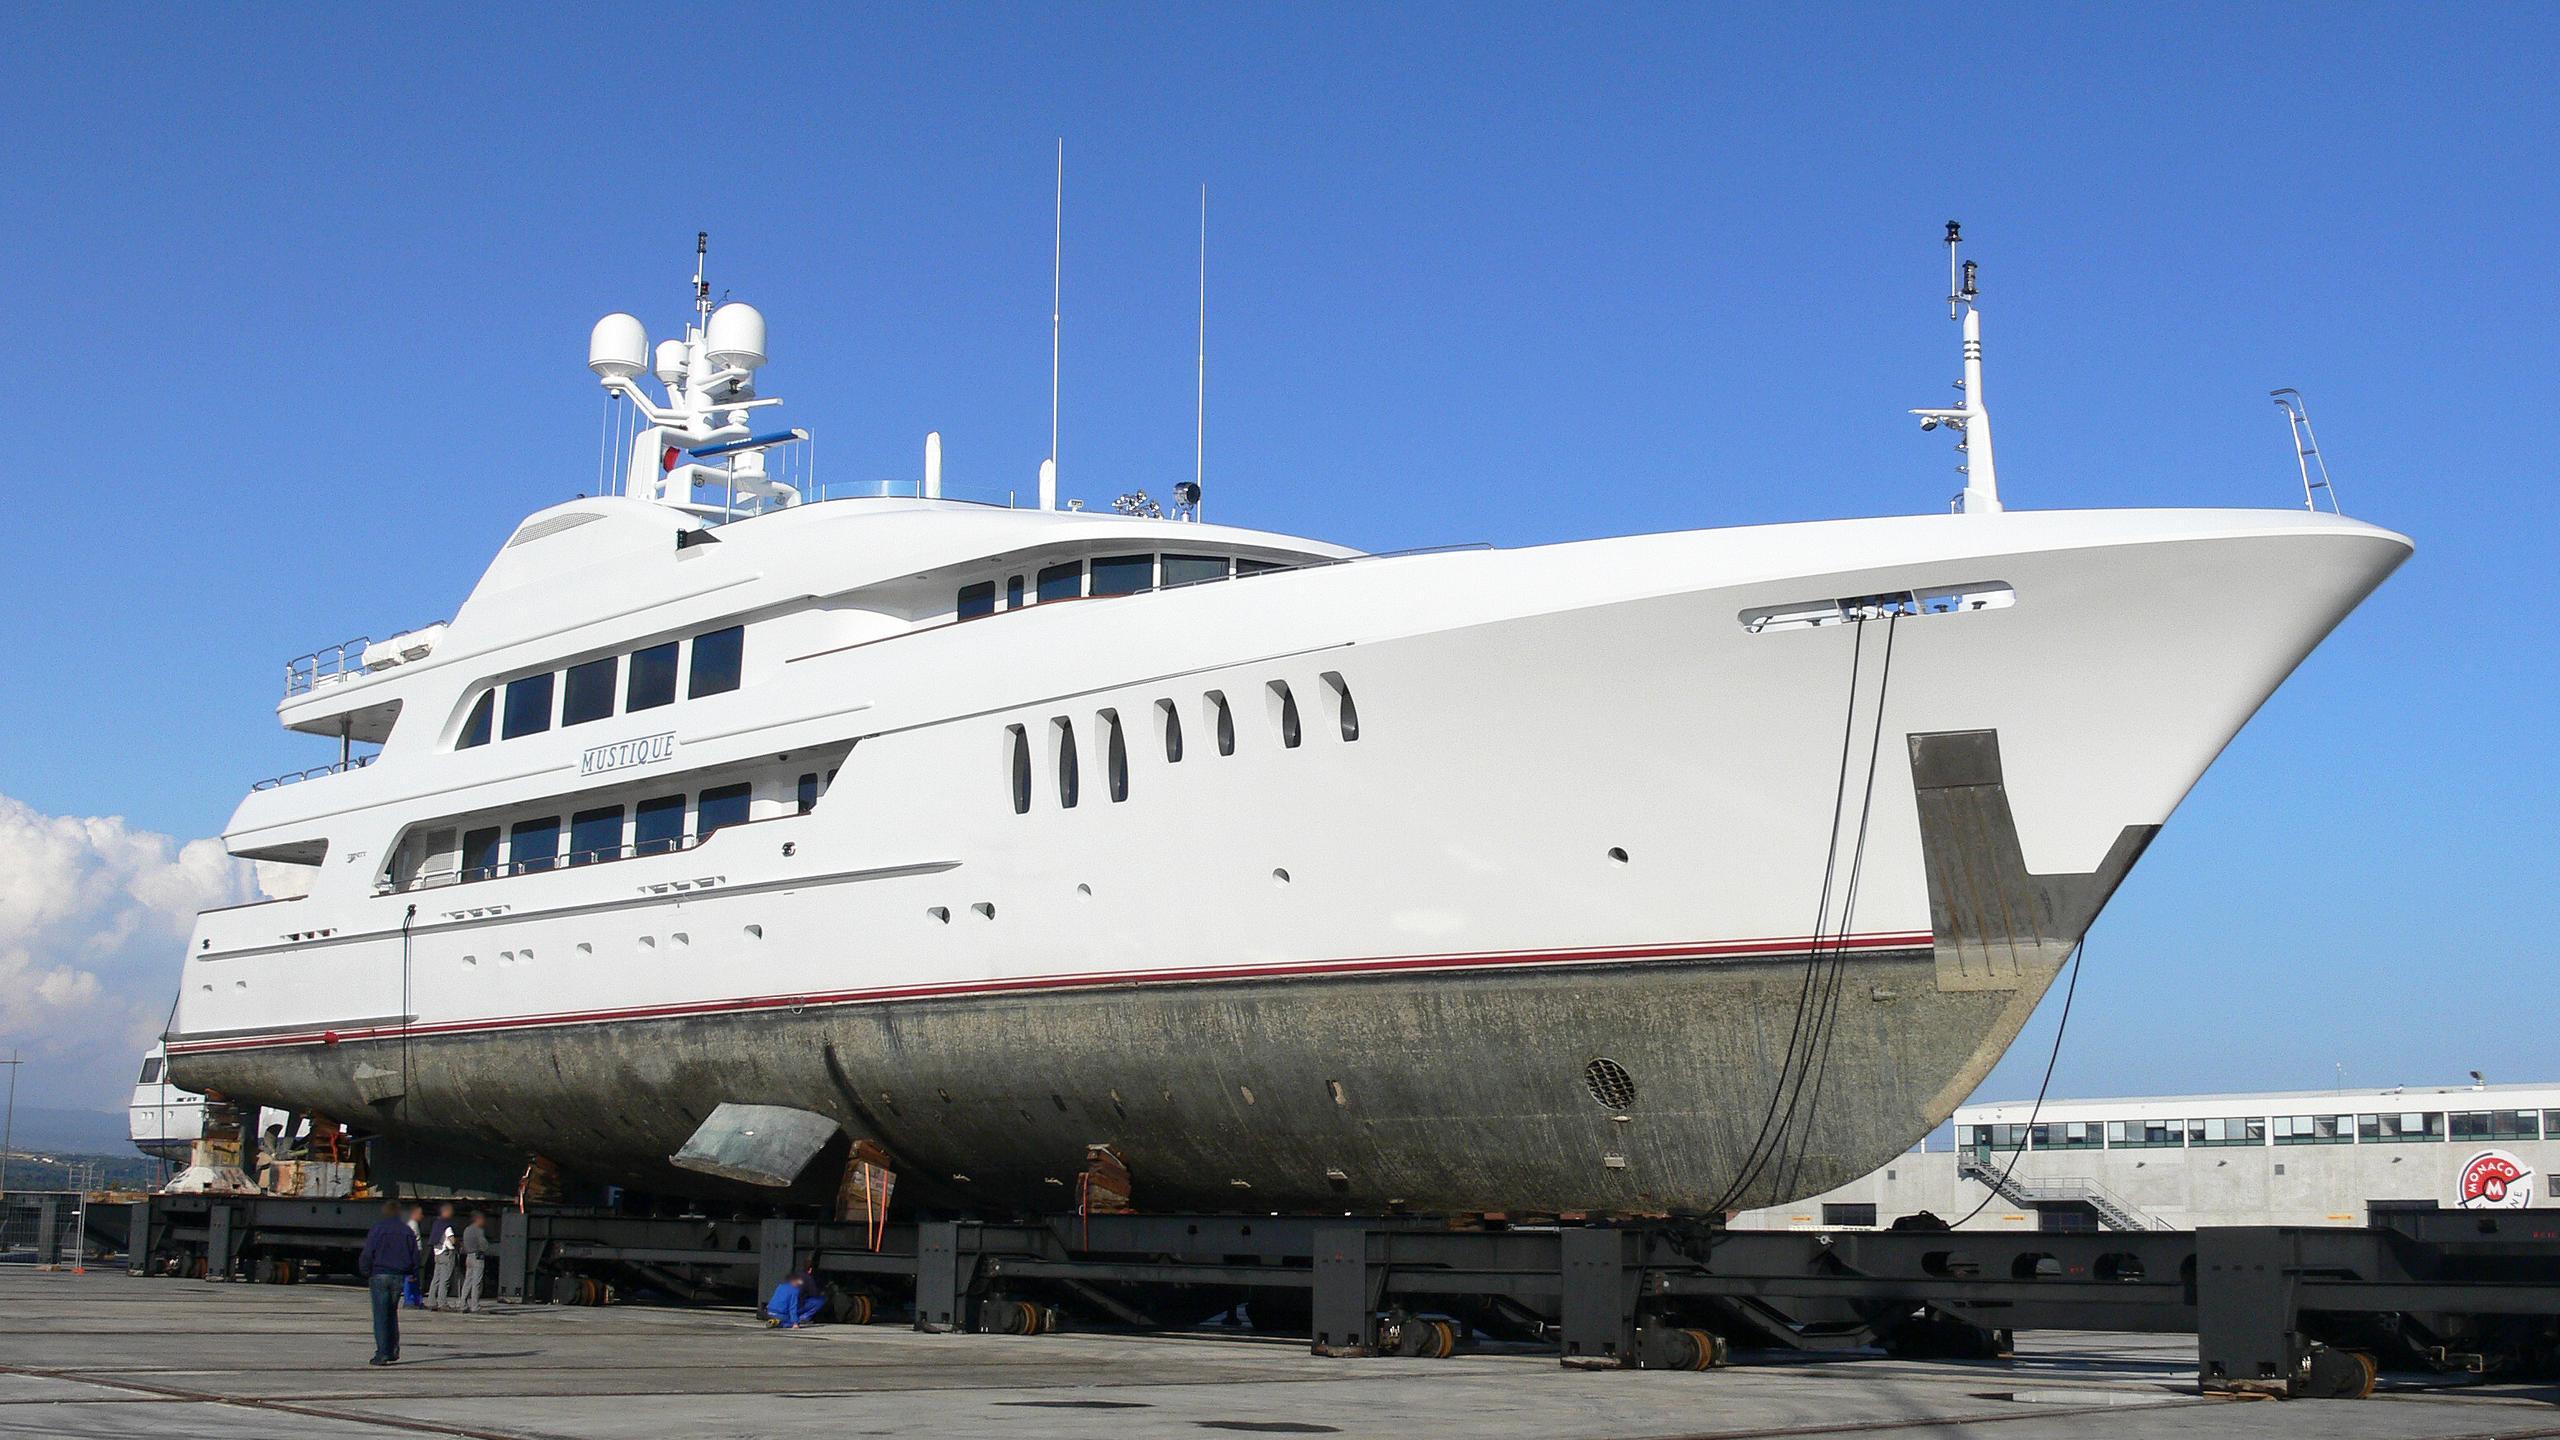 mustique-motor-yacht-trinity-180-2005-55m-bow-shipyard